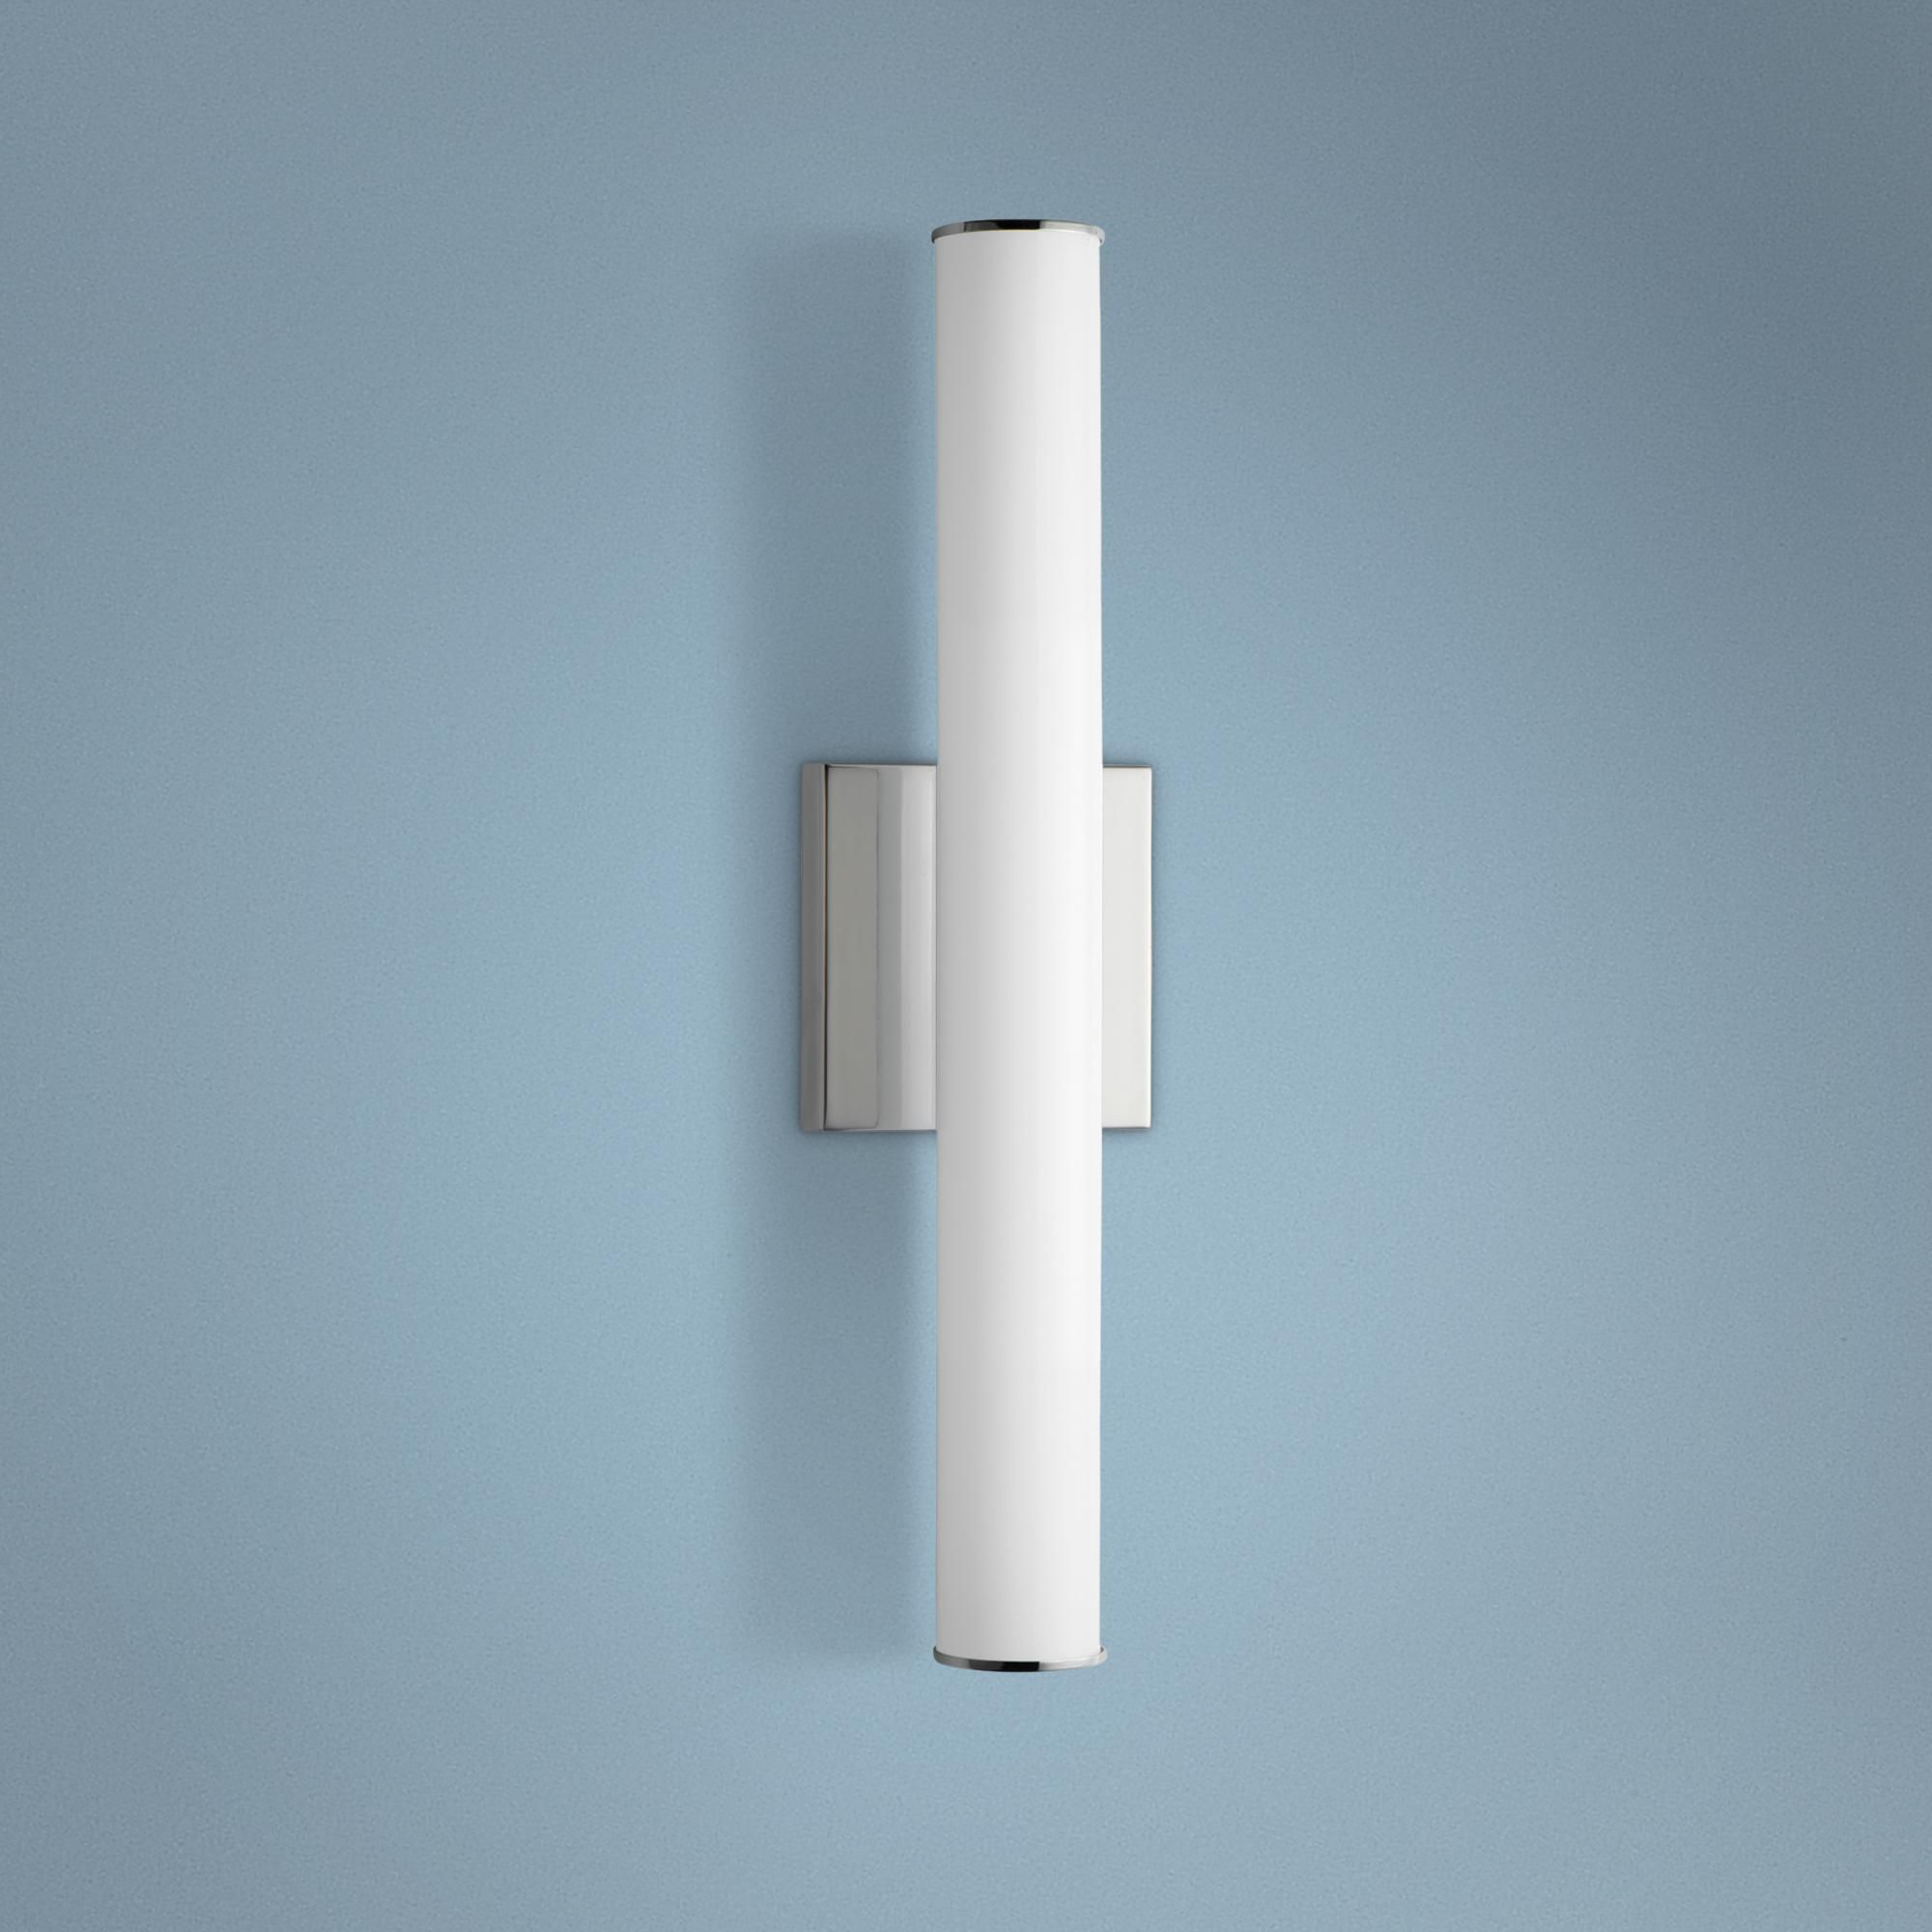 Pin On Wall Sconces Lighting